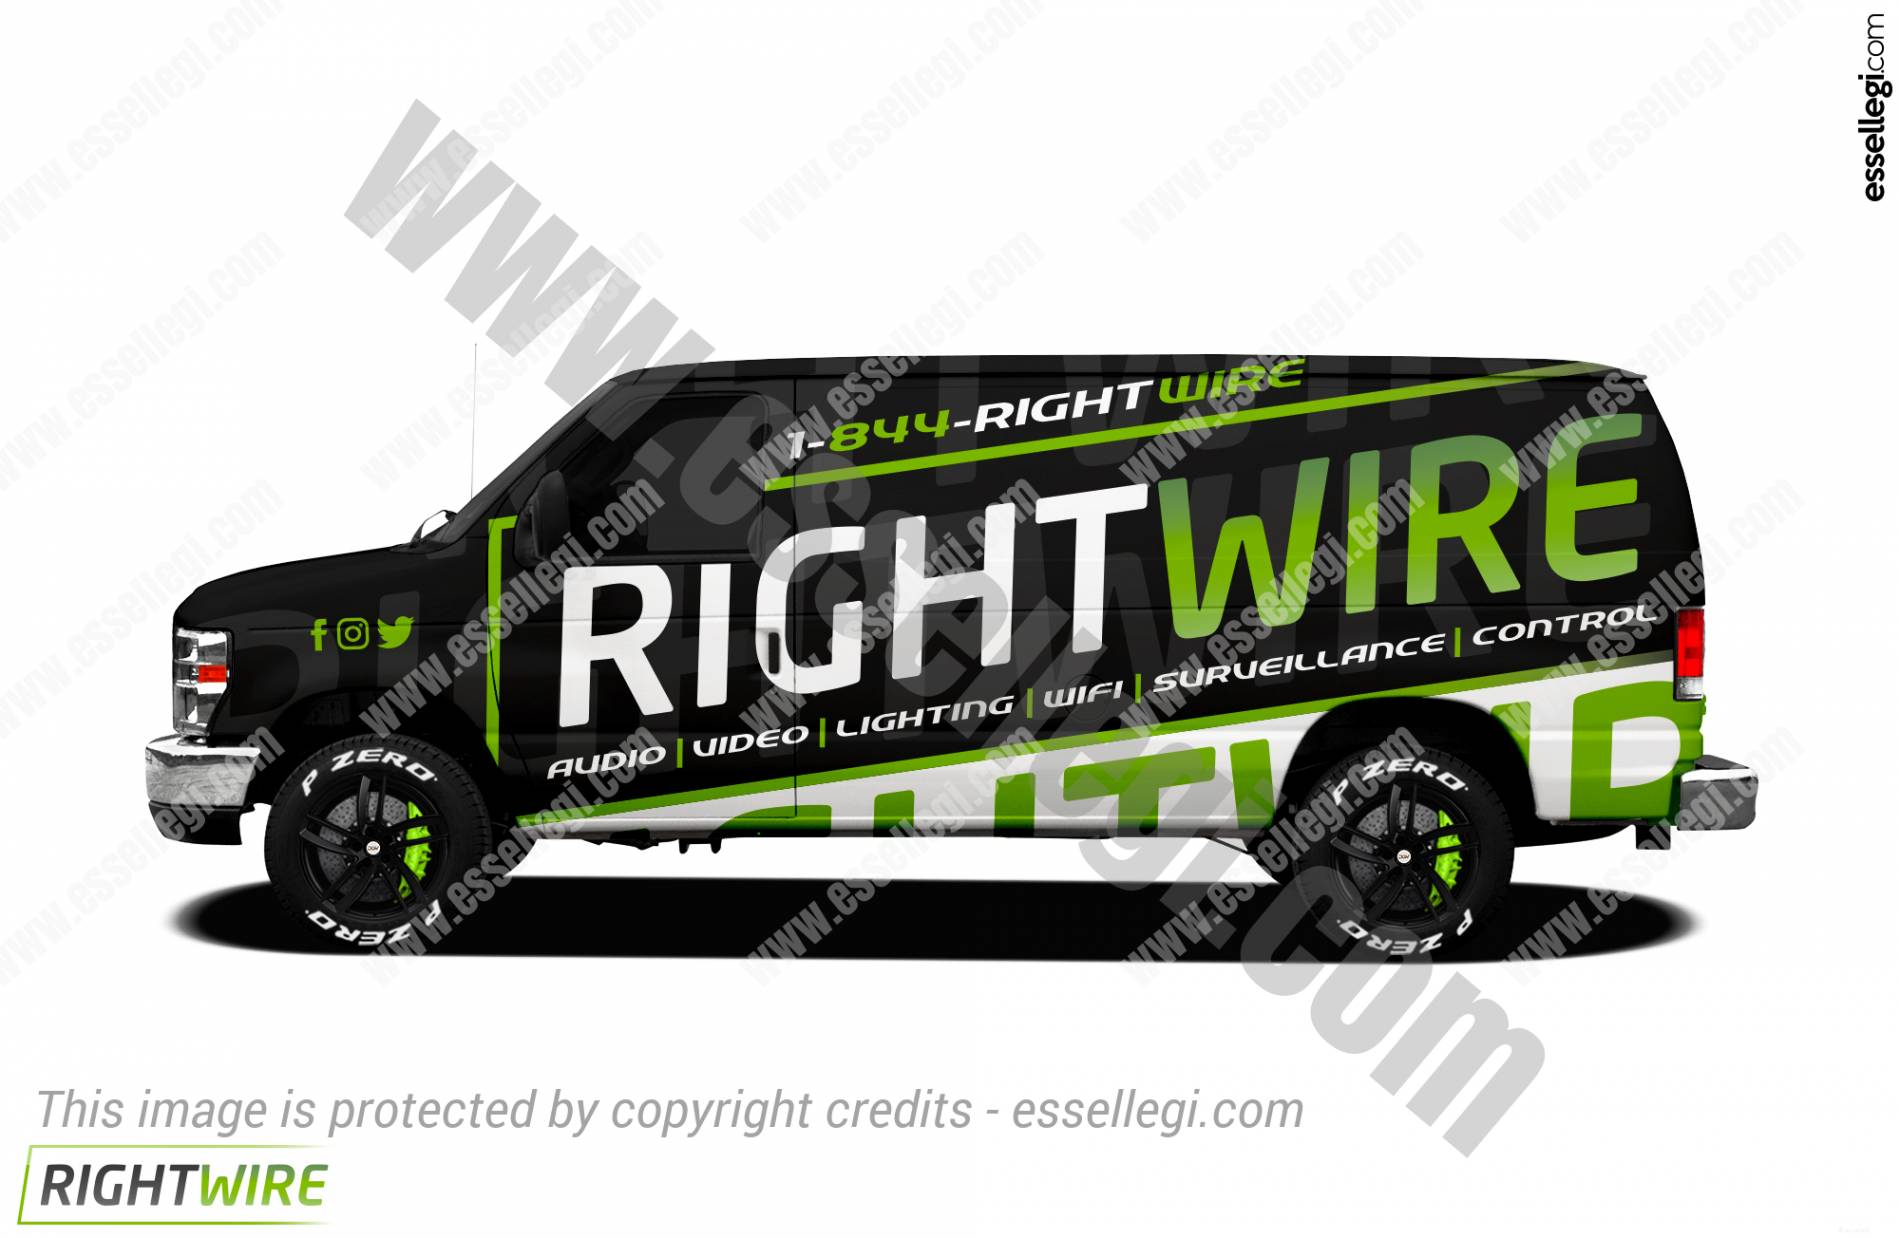 RIGHT WIRE | VAN WRAP DESIGN 🇺🇸